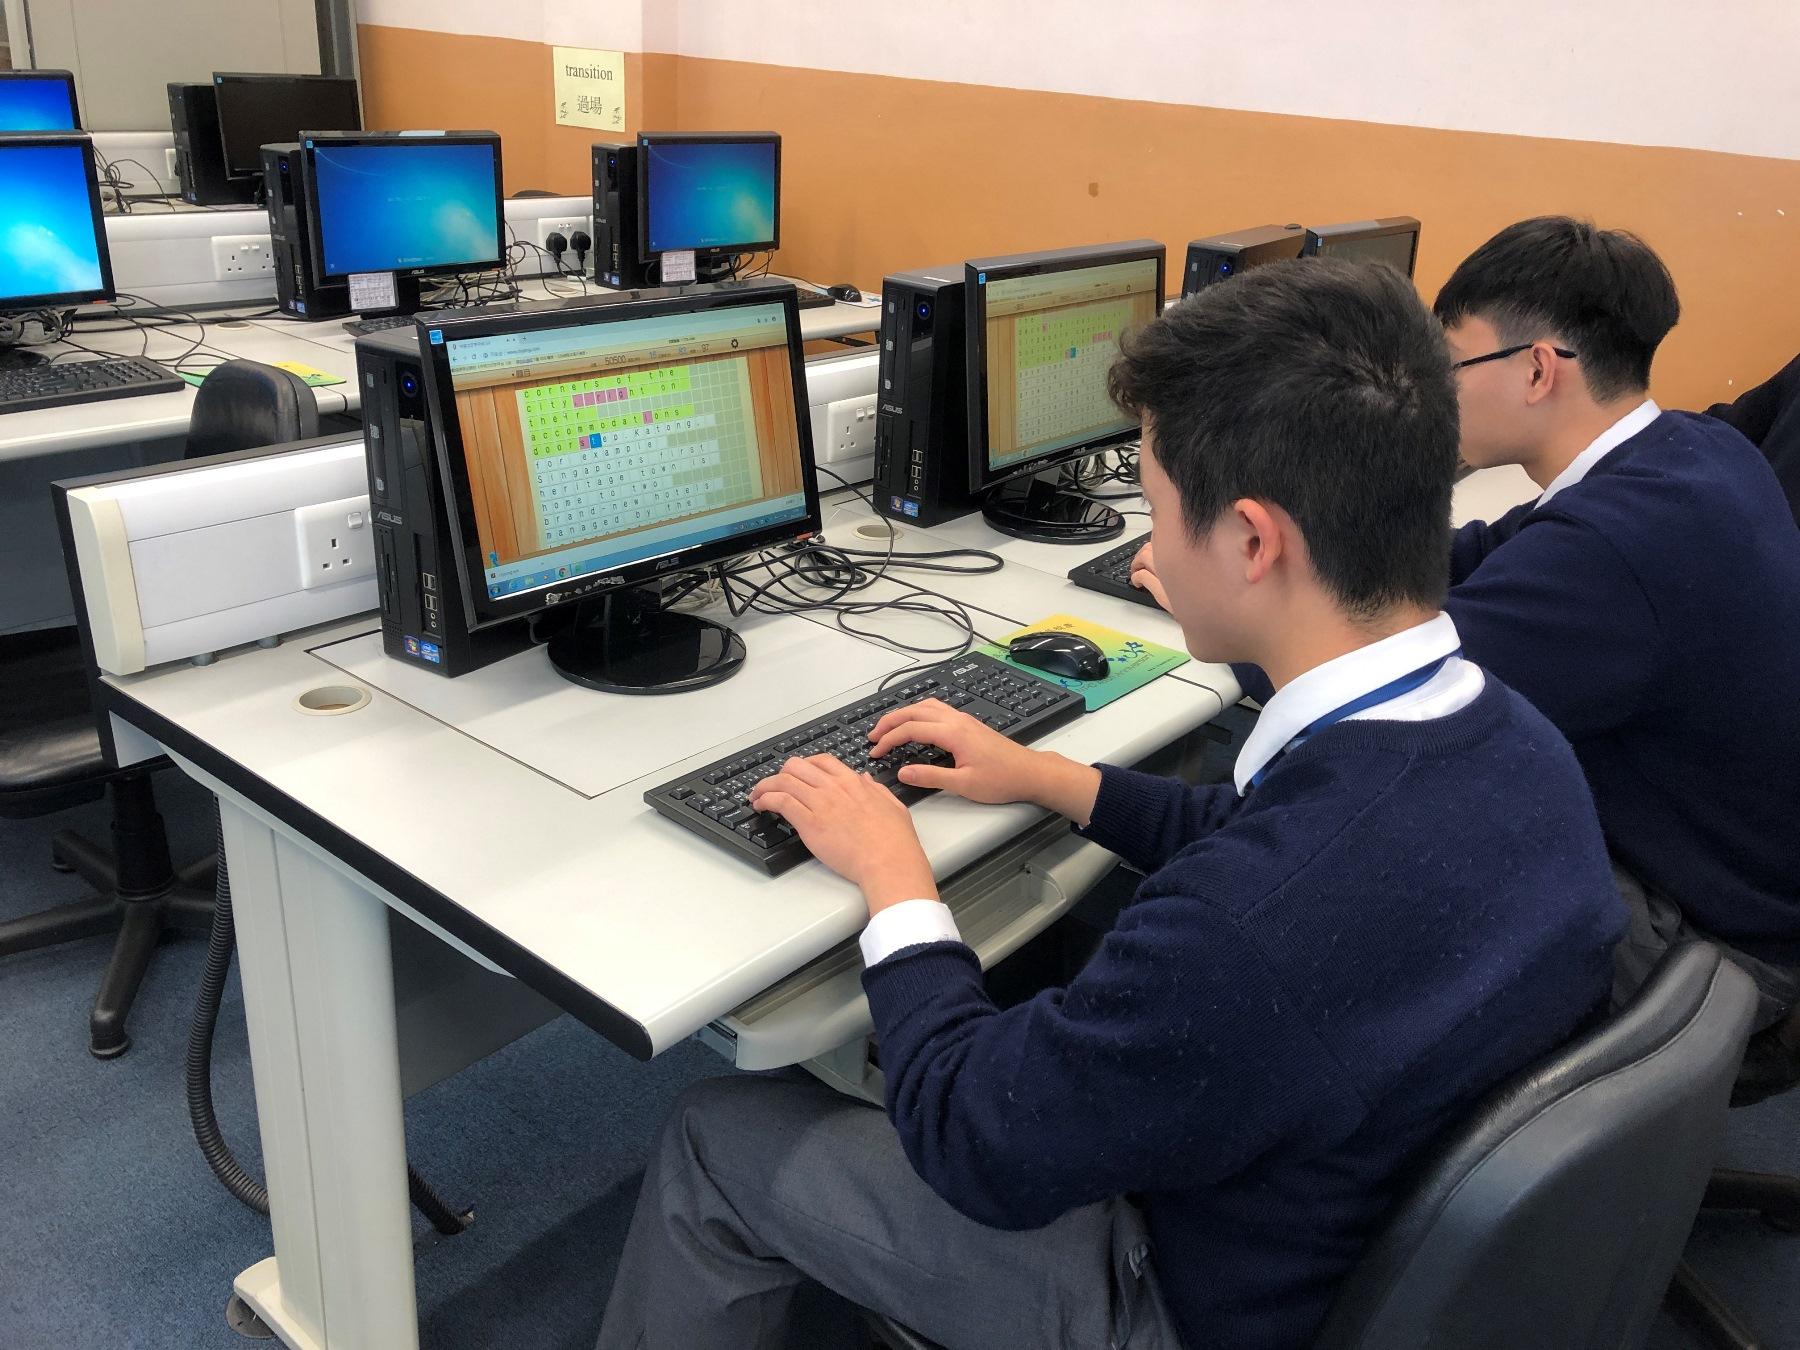 http://npc.edu.hk/sites/default/files/img_6901.jpg